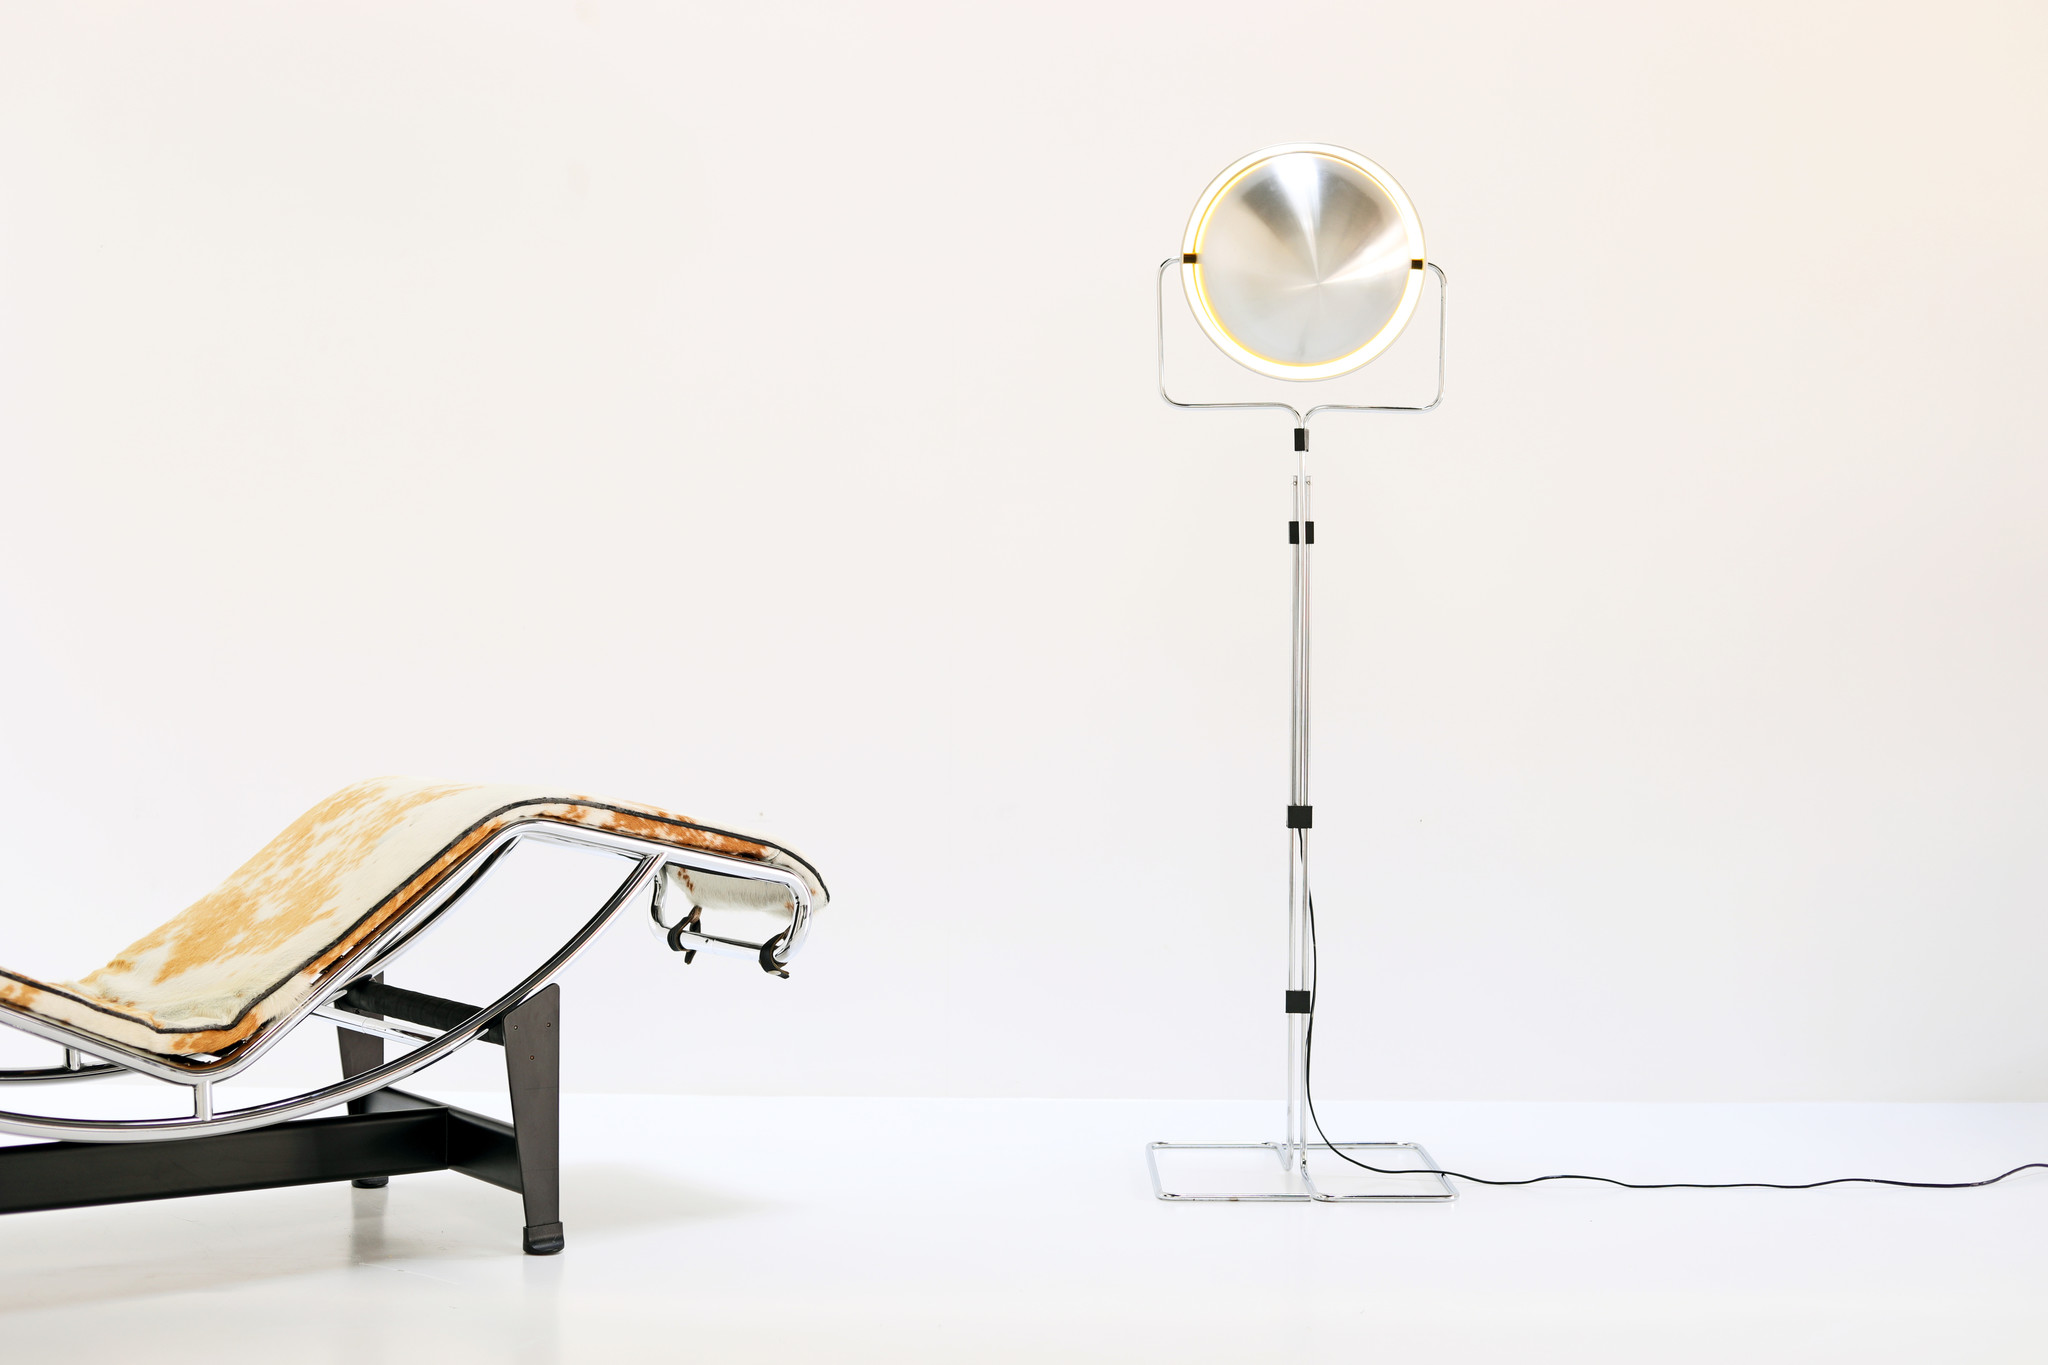 ECLIPSE FLOOR LAMP BY EVERT JELLE JELLES FOR RAAK